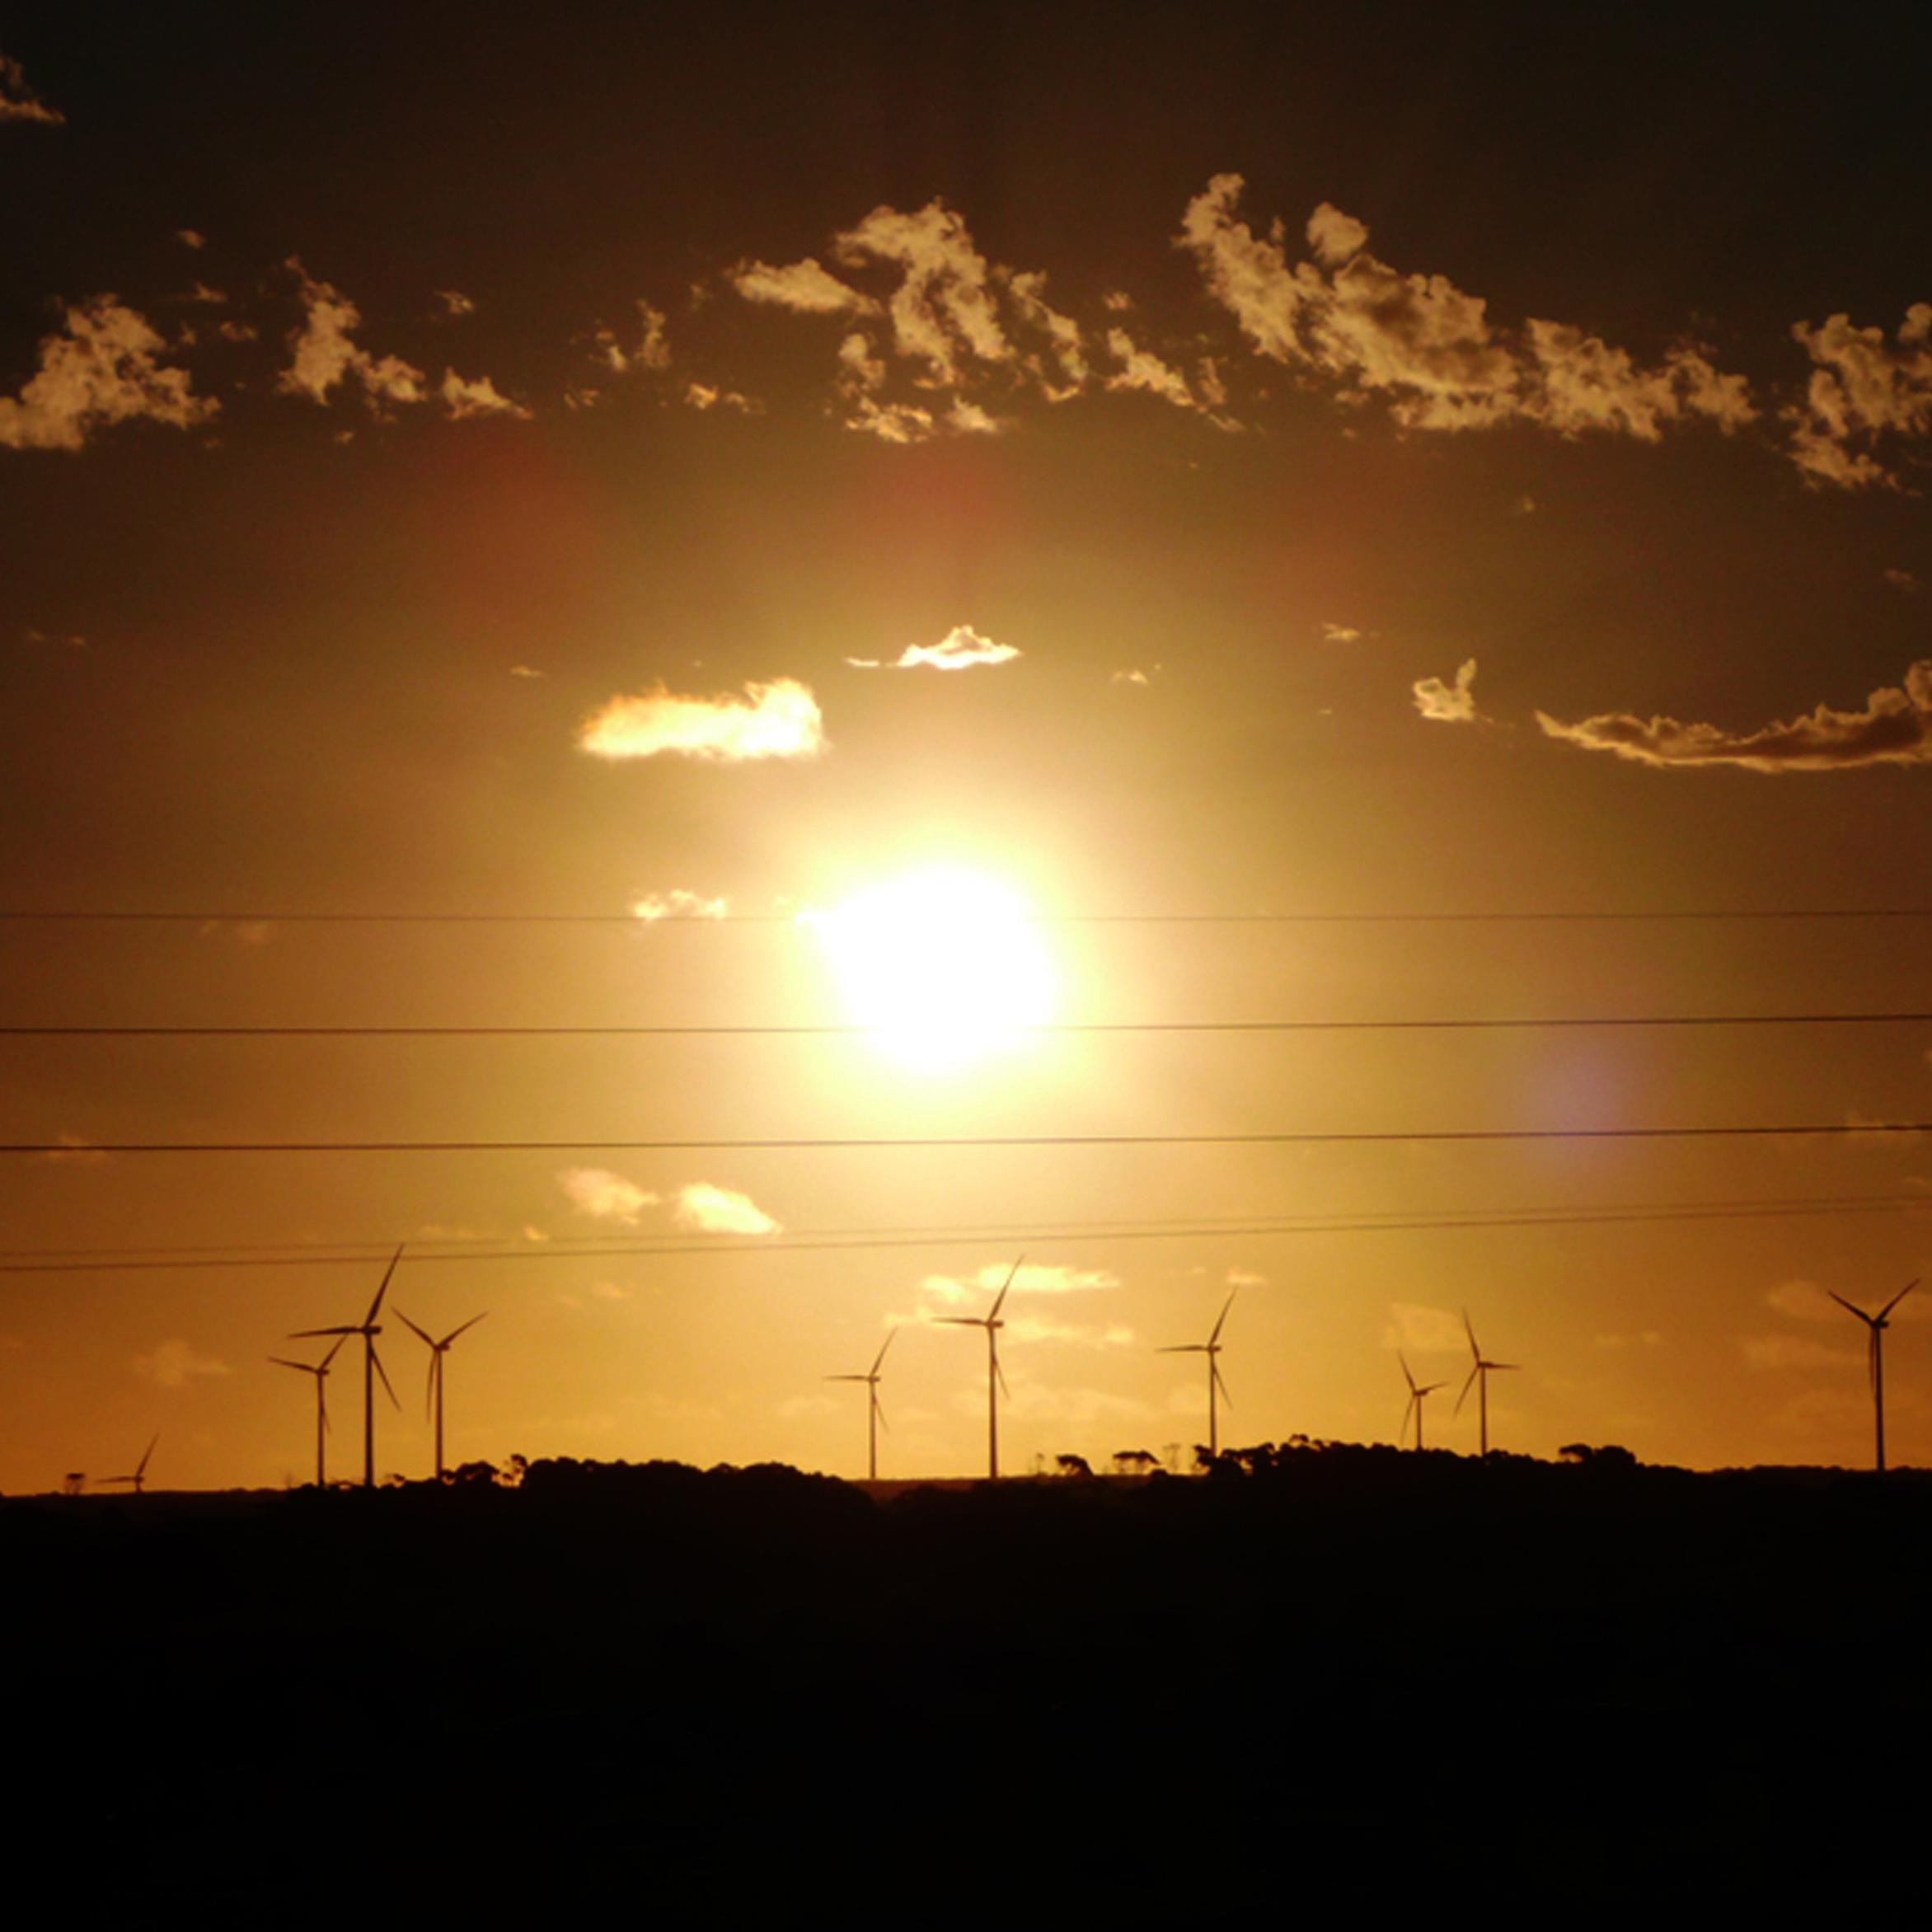 Woolnorth sunset flare, 29.12.07